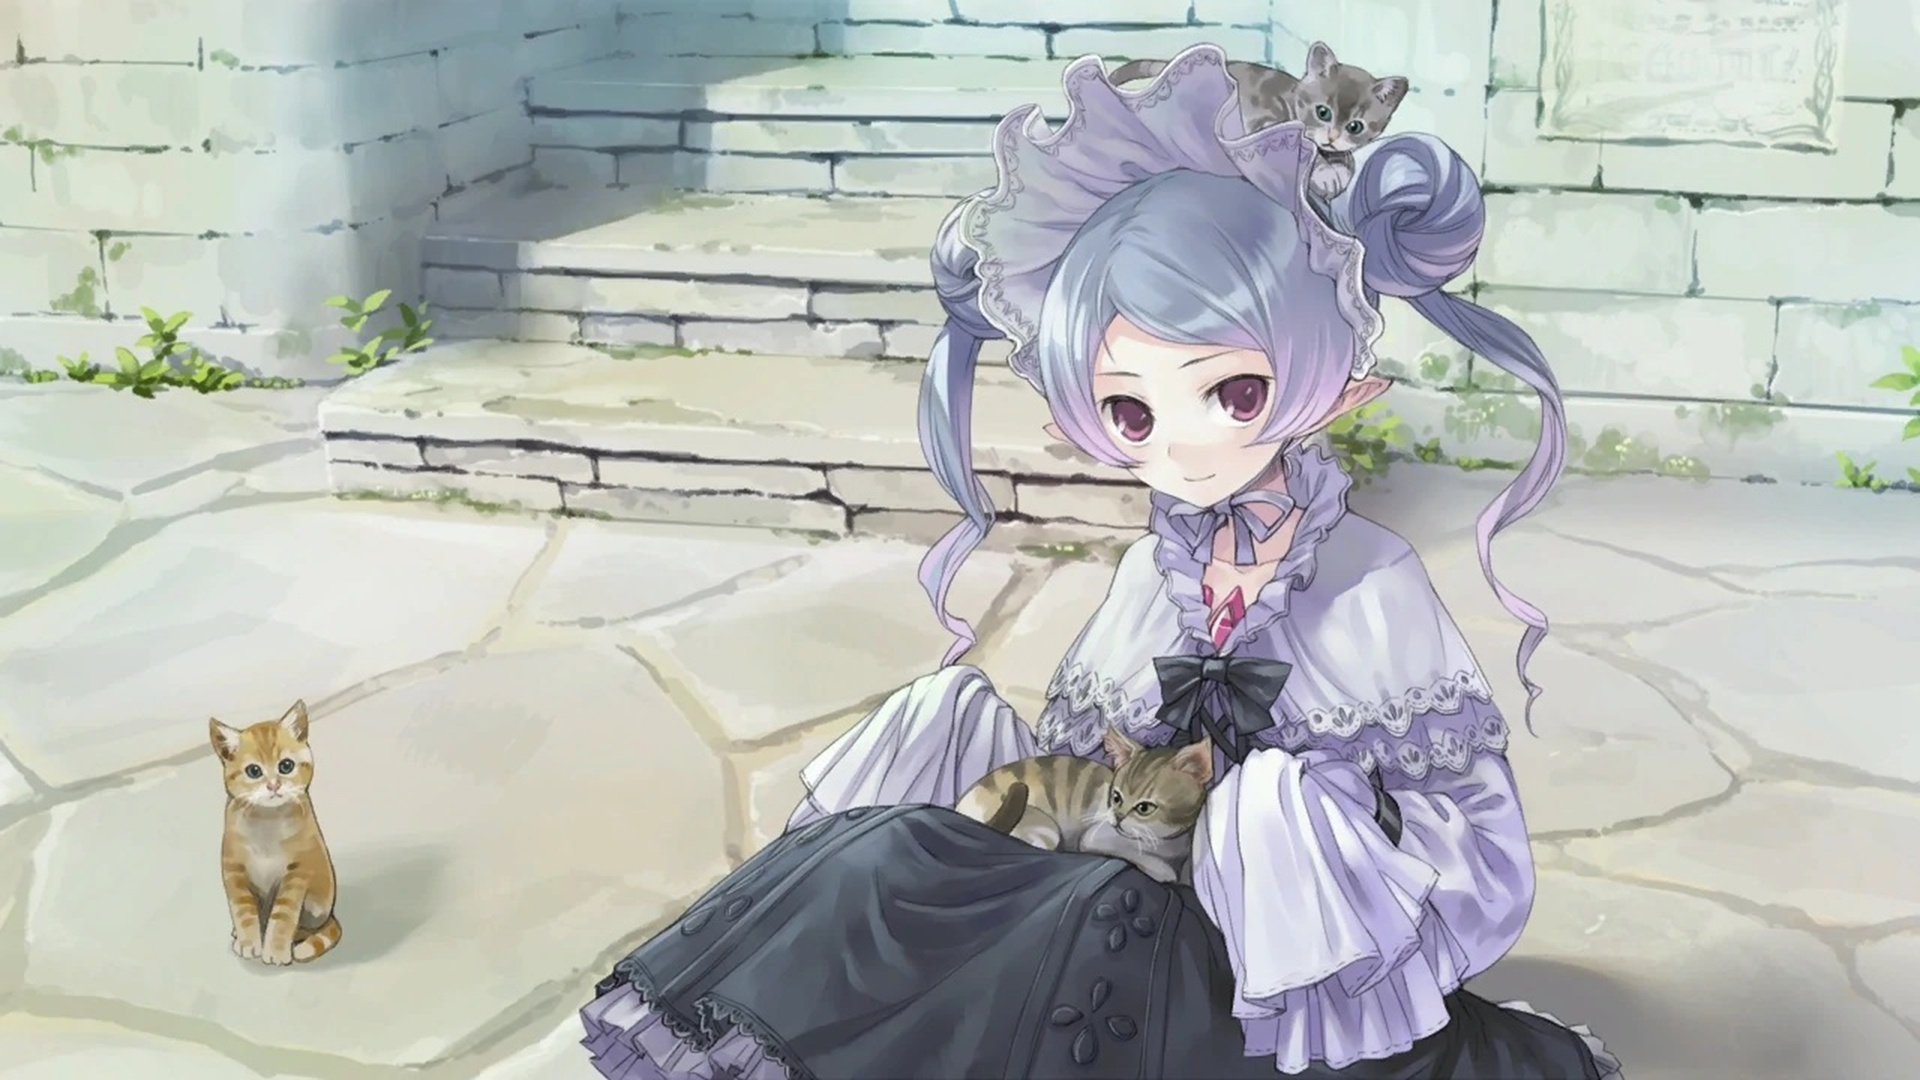 Atelier Rorona The Alchemist of Arland Wallpaper 020